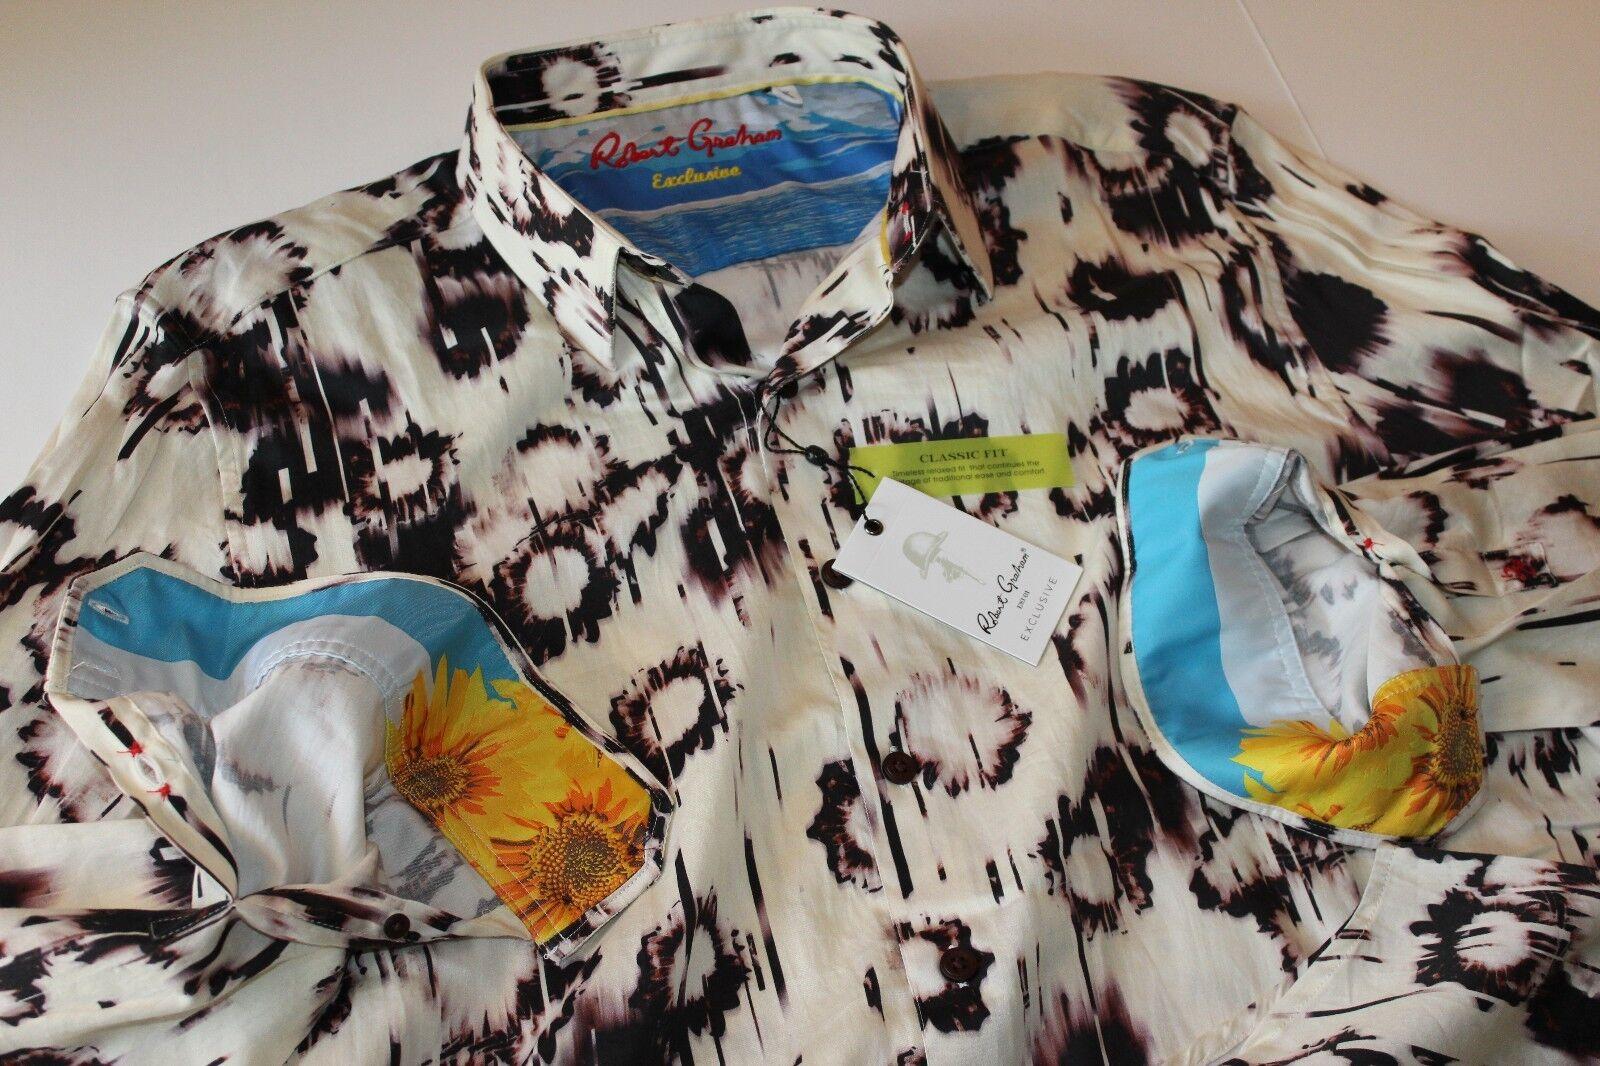 f3e3f3f2 Robert Graham Shirt Exclusive White Star RR151407CF Cream LS XX-Large 2XL. '